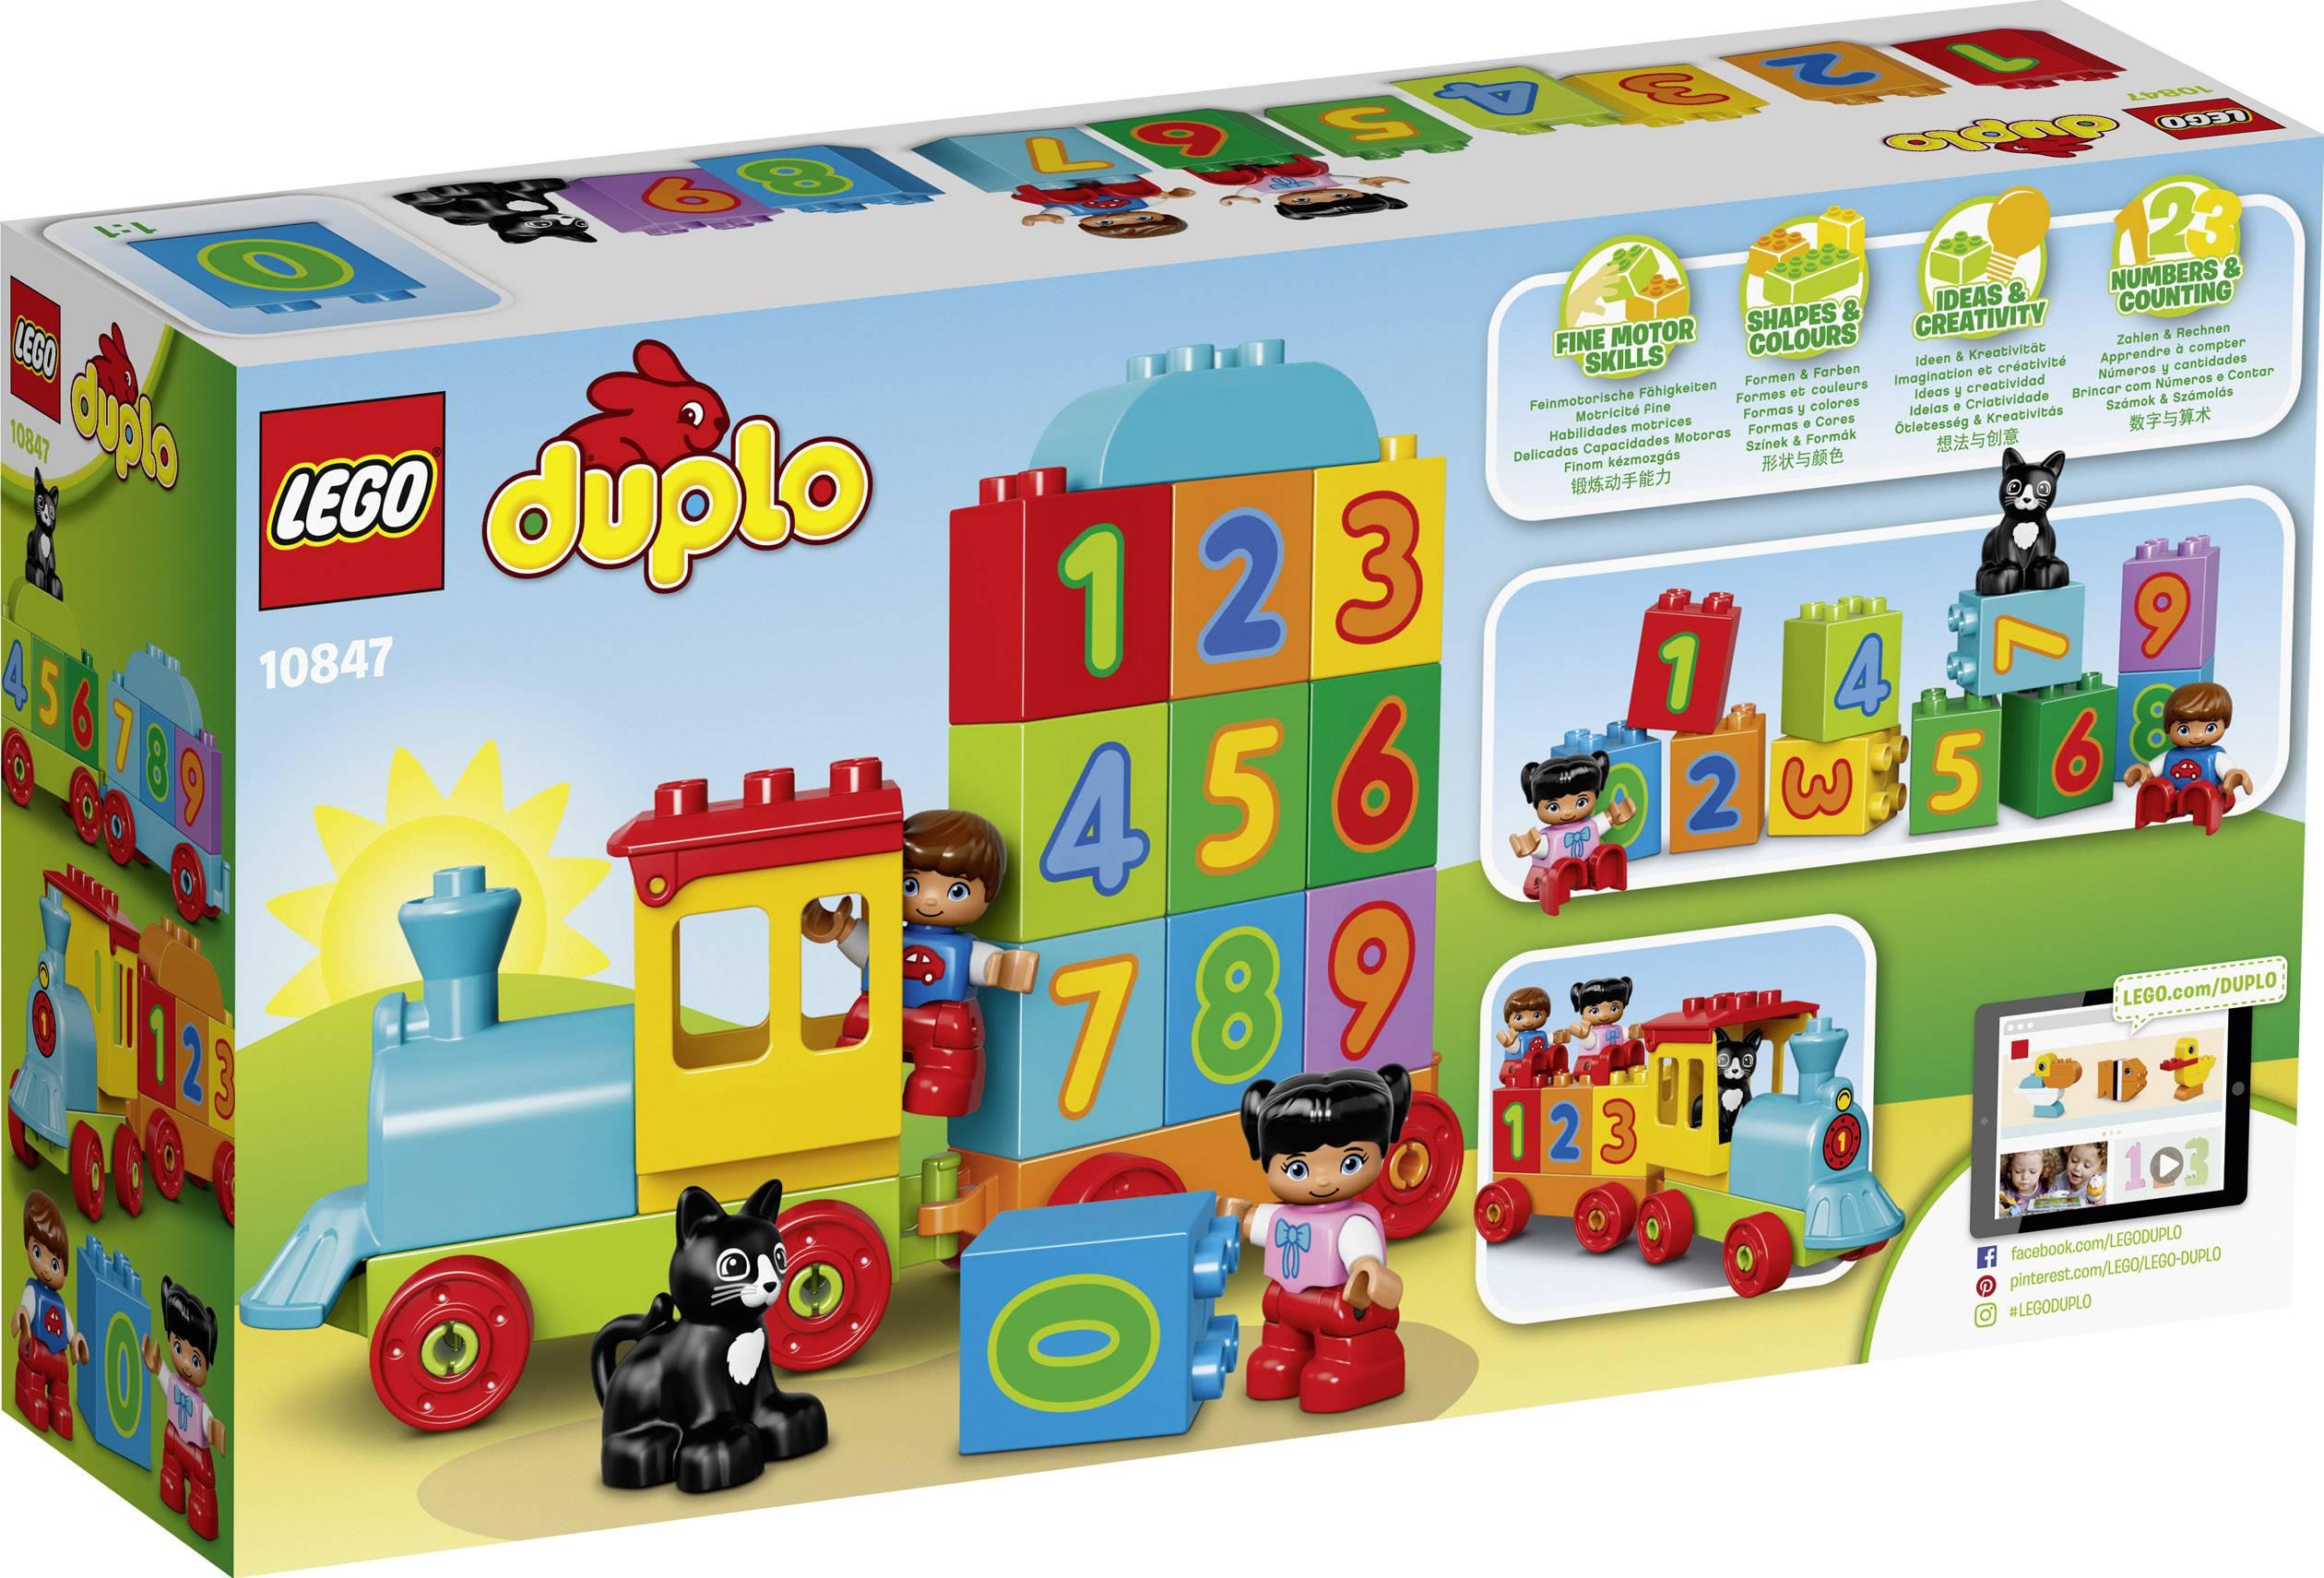 1x Lego Duplo Platte Palette silber dunkel grau 4x4 Flughafen Eisenbahn 47415